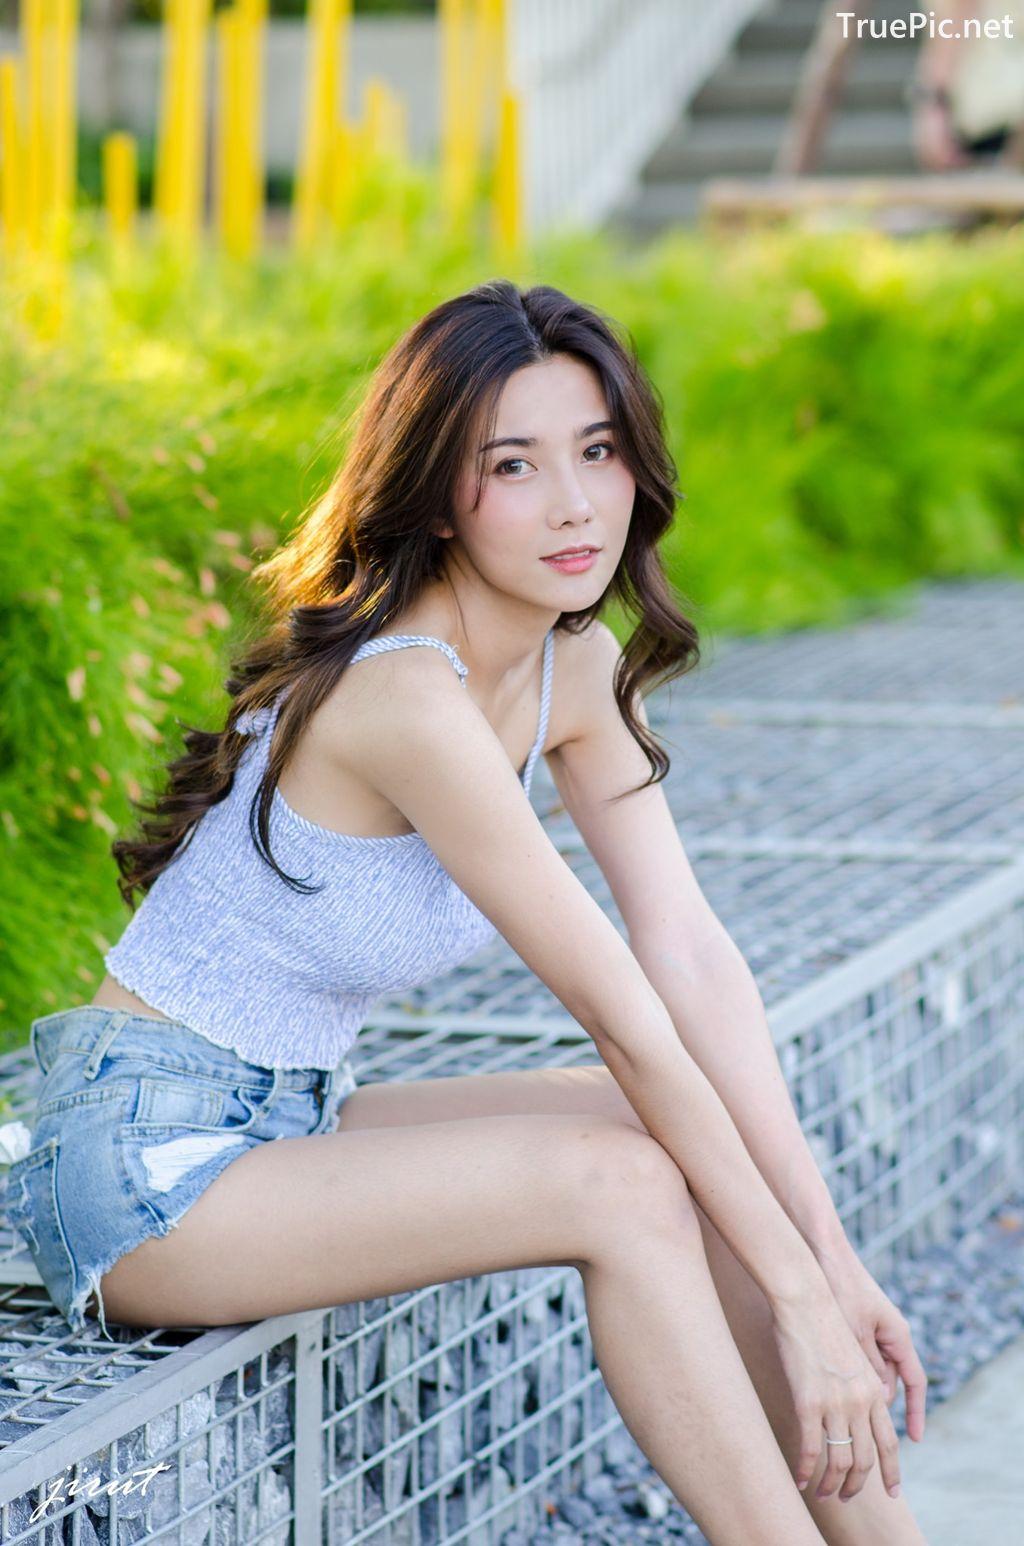 Image-Thailand-Model-Baiyok-Panachon-Cute-White-Crop-Top-and-Short-Jean-TruePic.net- Picture-7